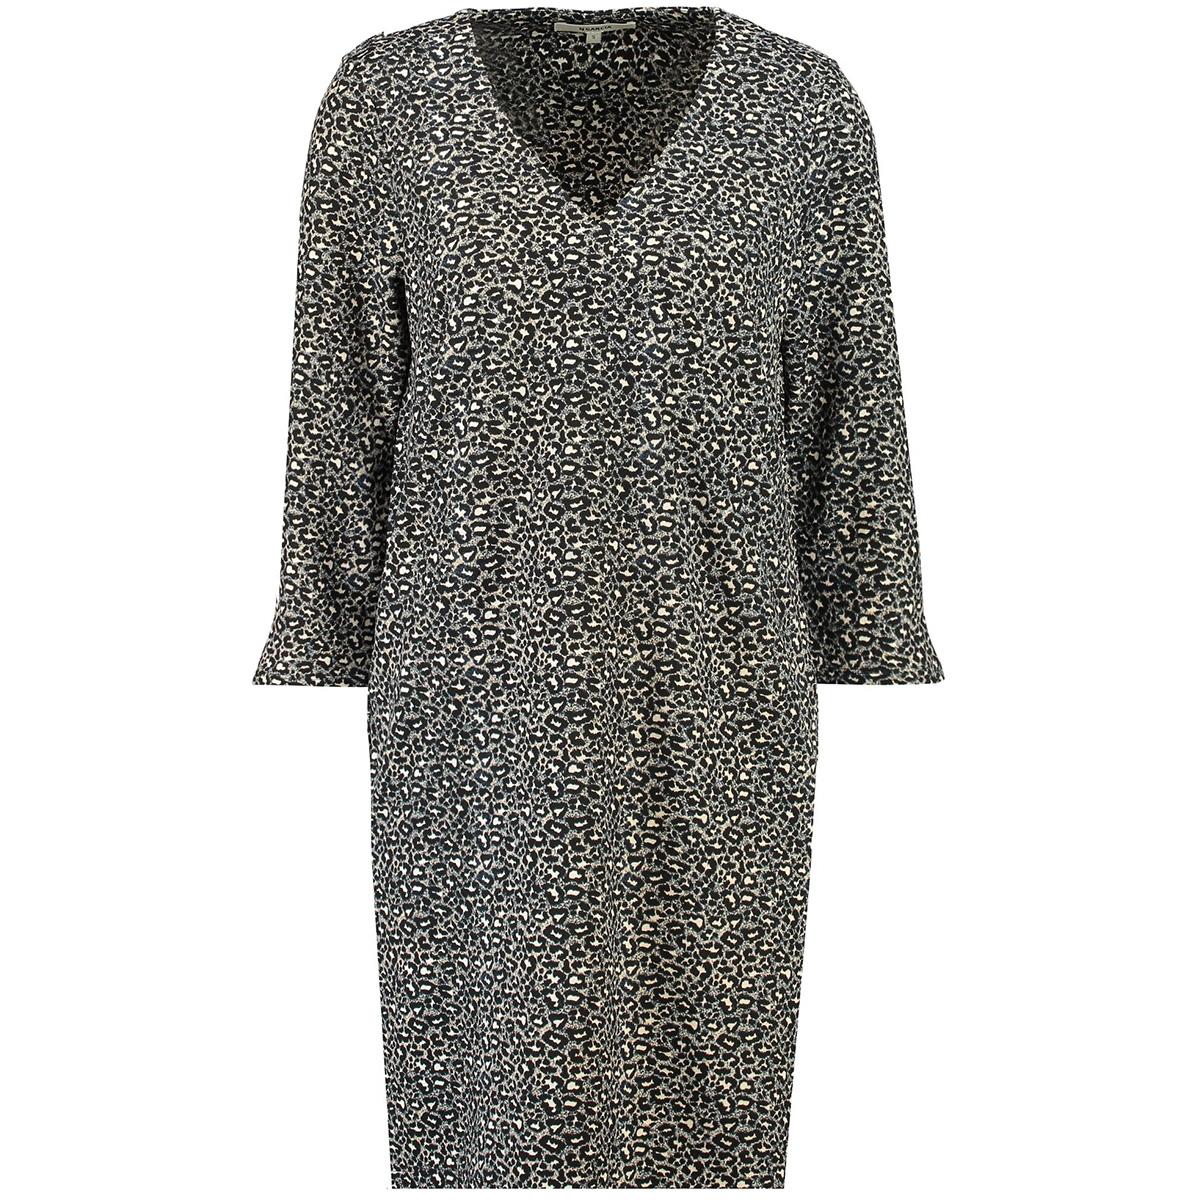 jurk met panterprint i90080 garcia jurk 60 black